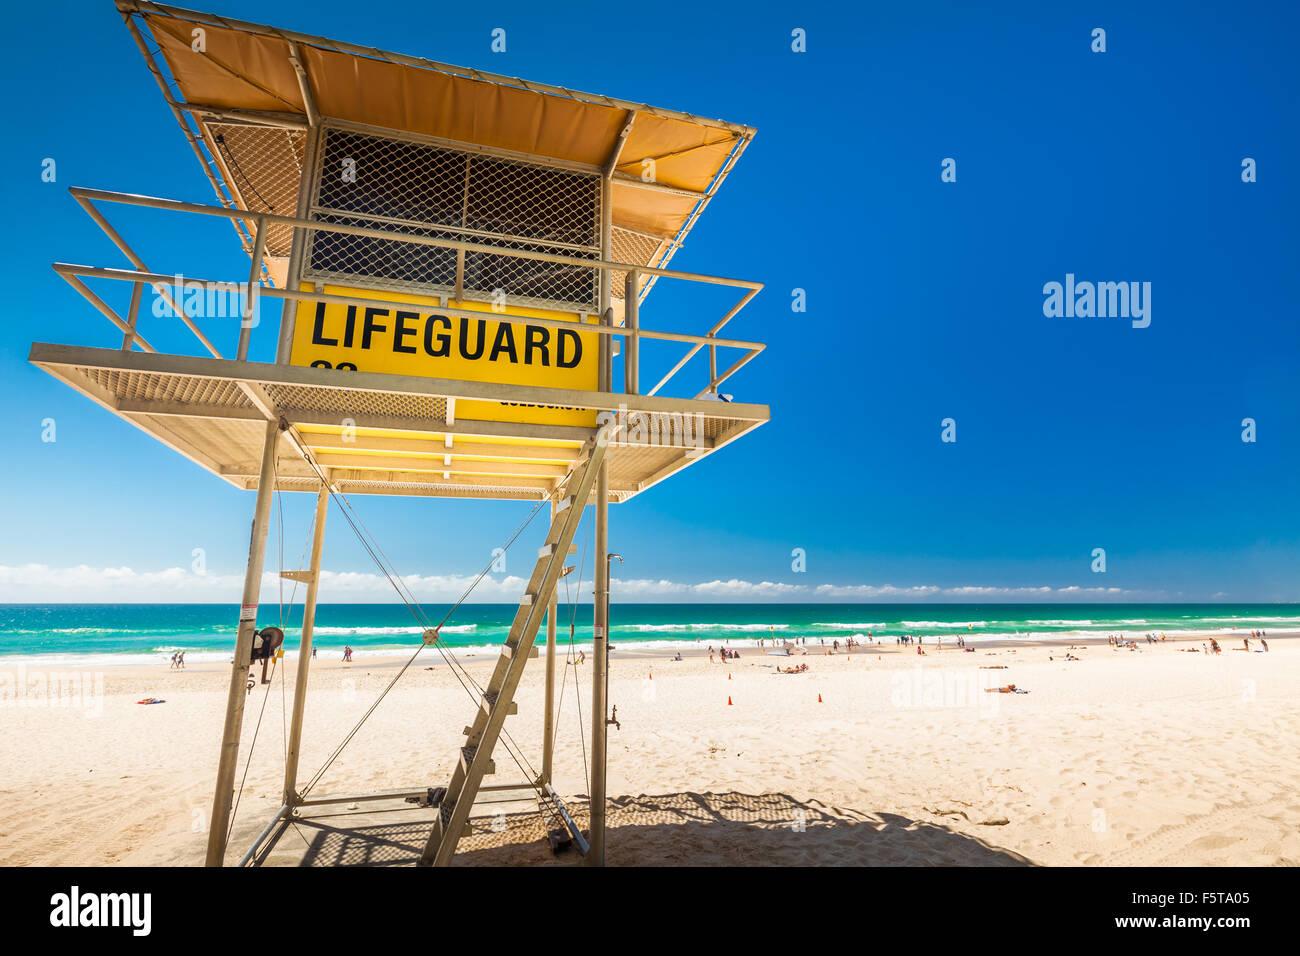 Torre de patrulla de socorrista en la Gold Coast, Queensland, Australia Imagen De Stock